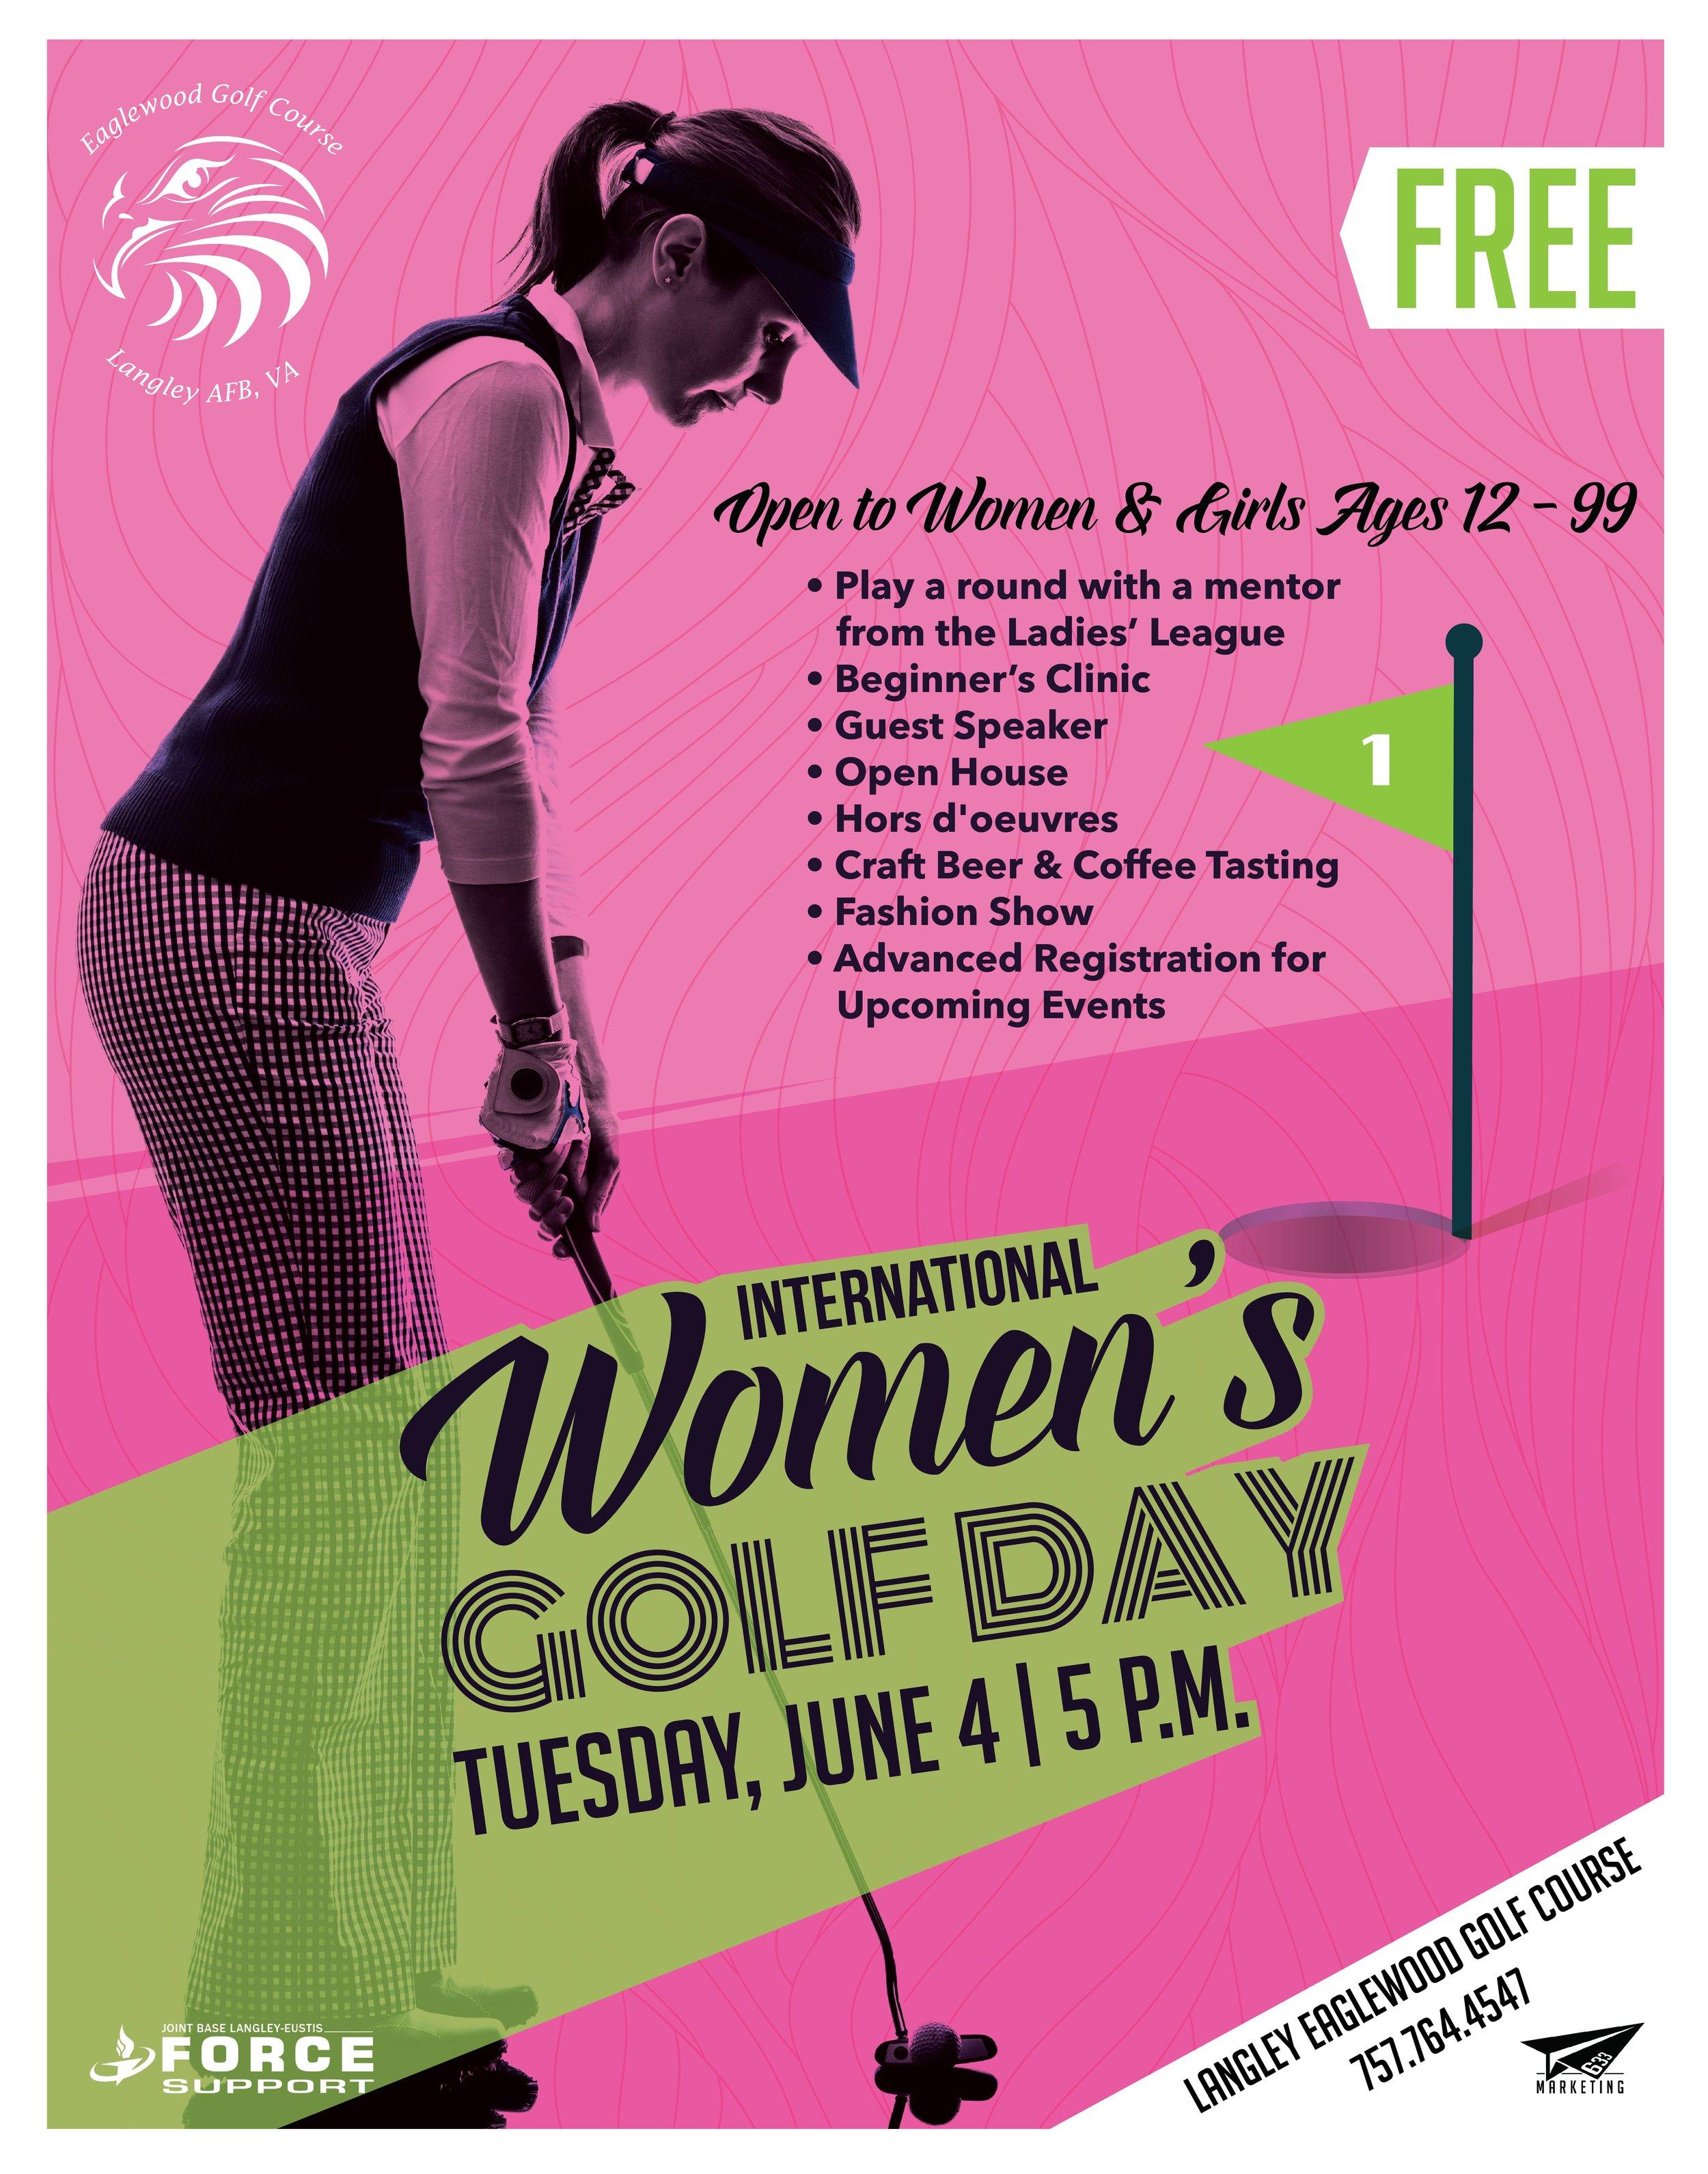 06-19 Women's Golf Day.jpg